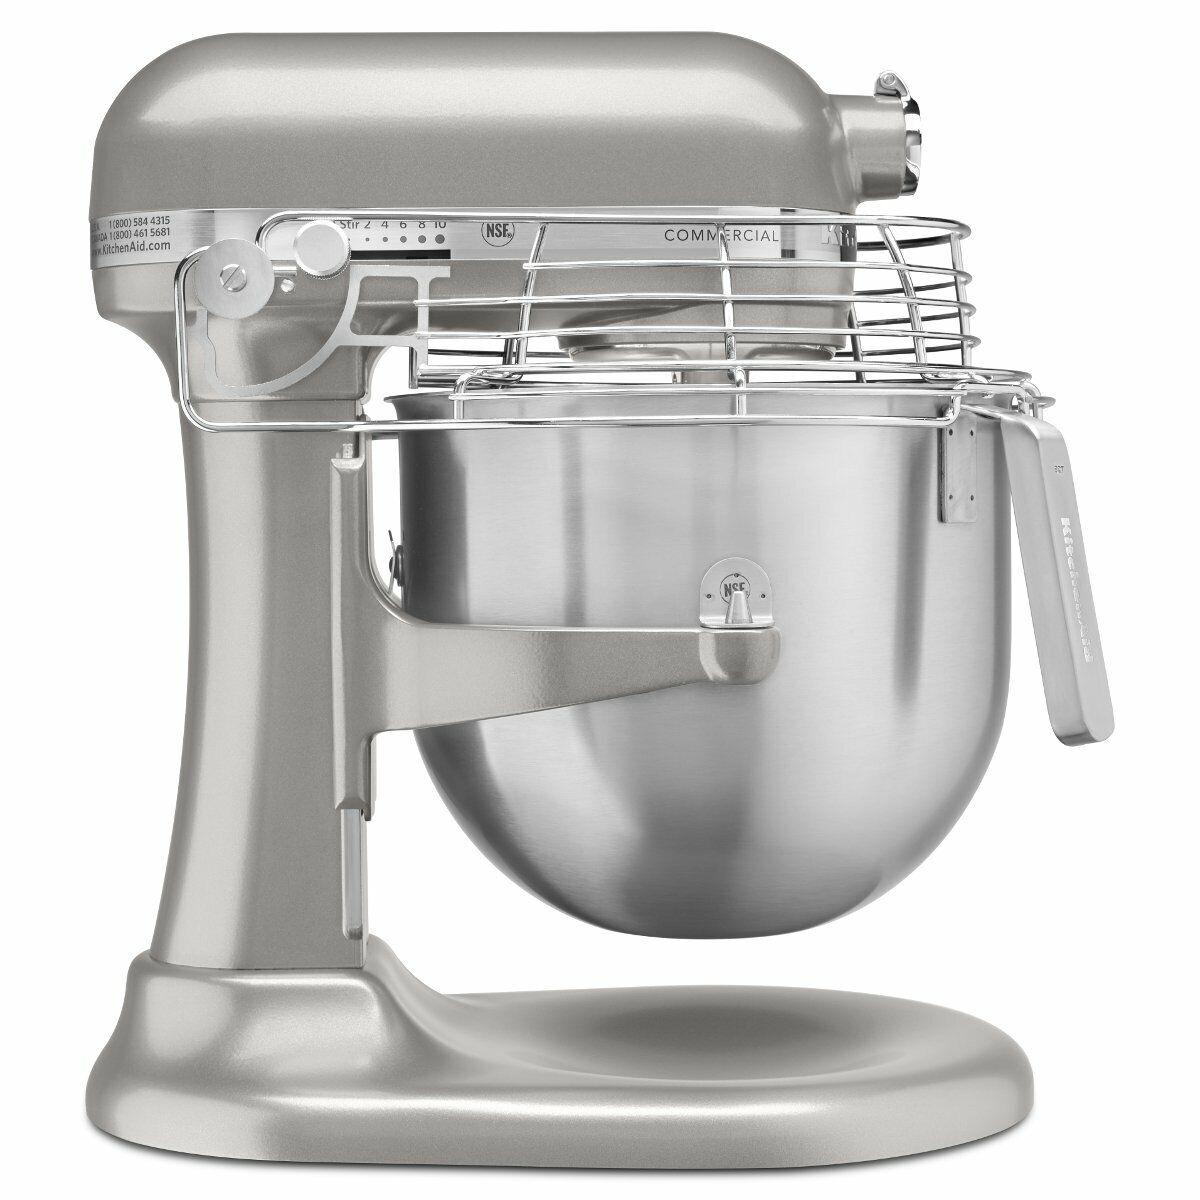 KitchenAid KSMC 895NP 8-Quart Commerciale Comptoir mixeur avec bol-Garde, vitesse 10